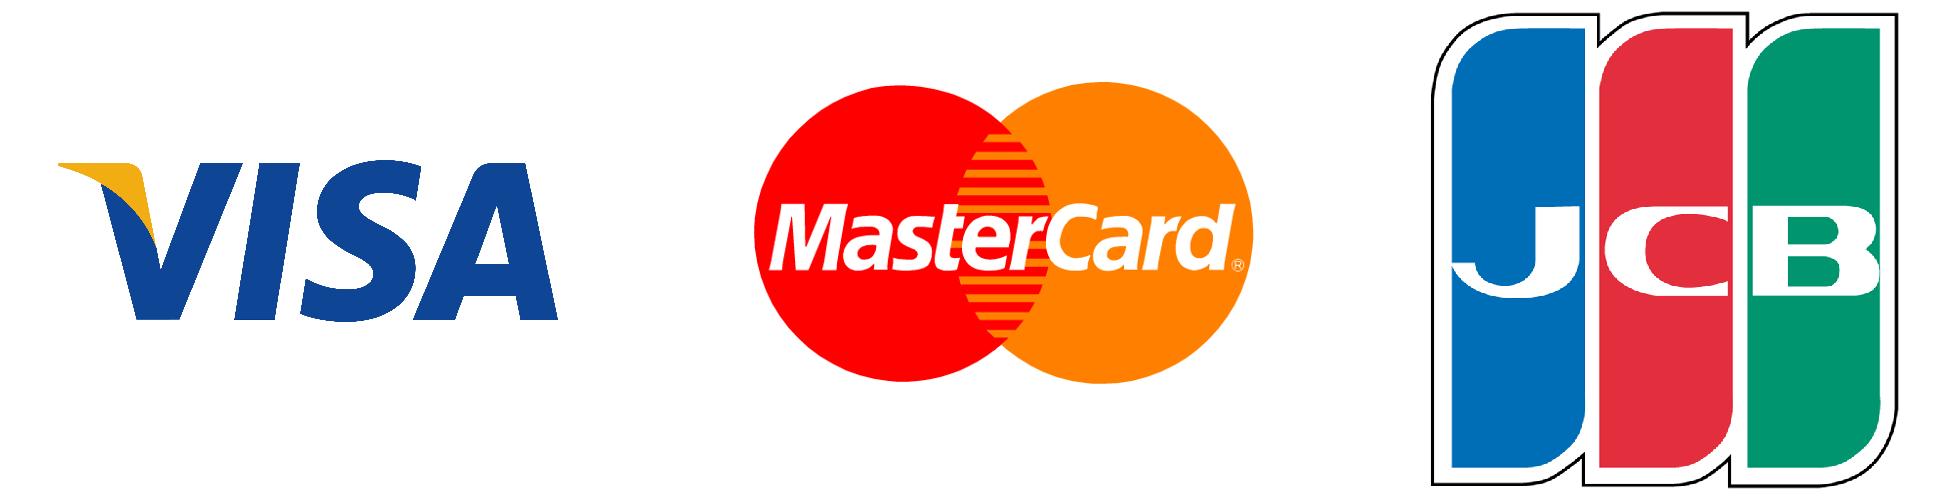 Visa Master Icon #22247.